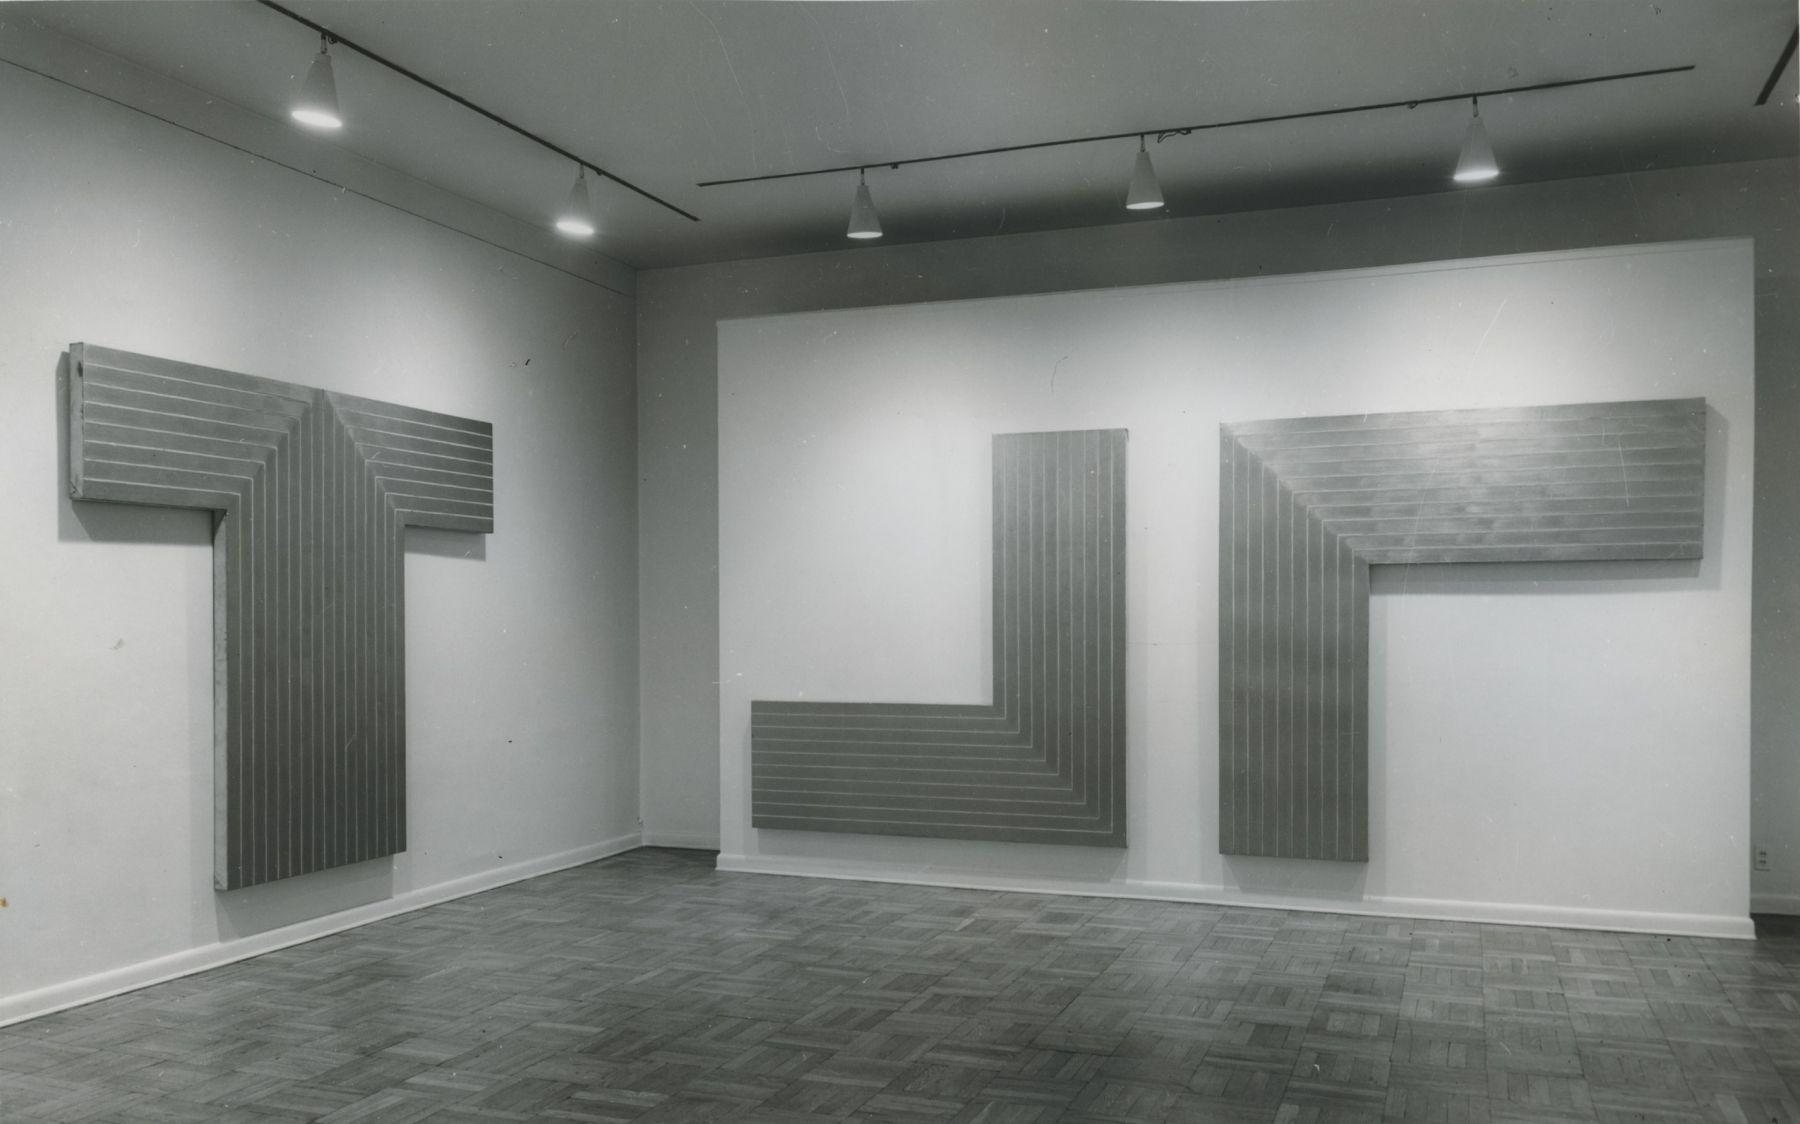 Installation view, Frank Stella, 4 EAST 77.